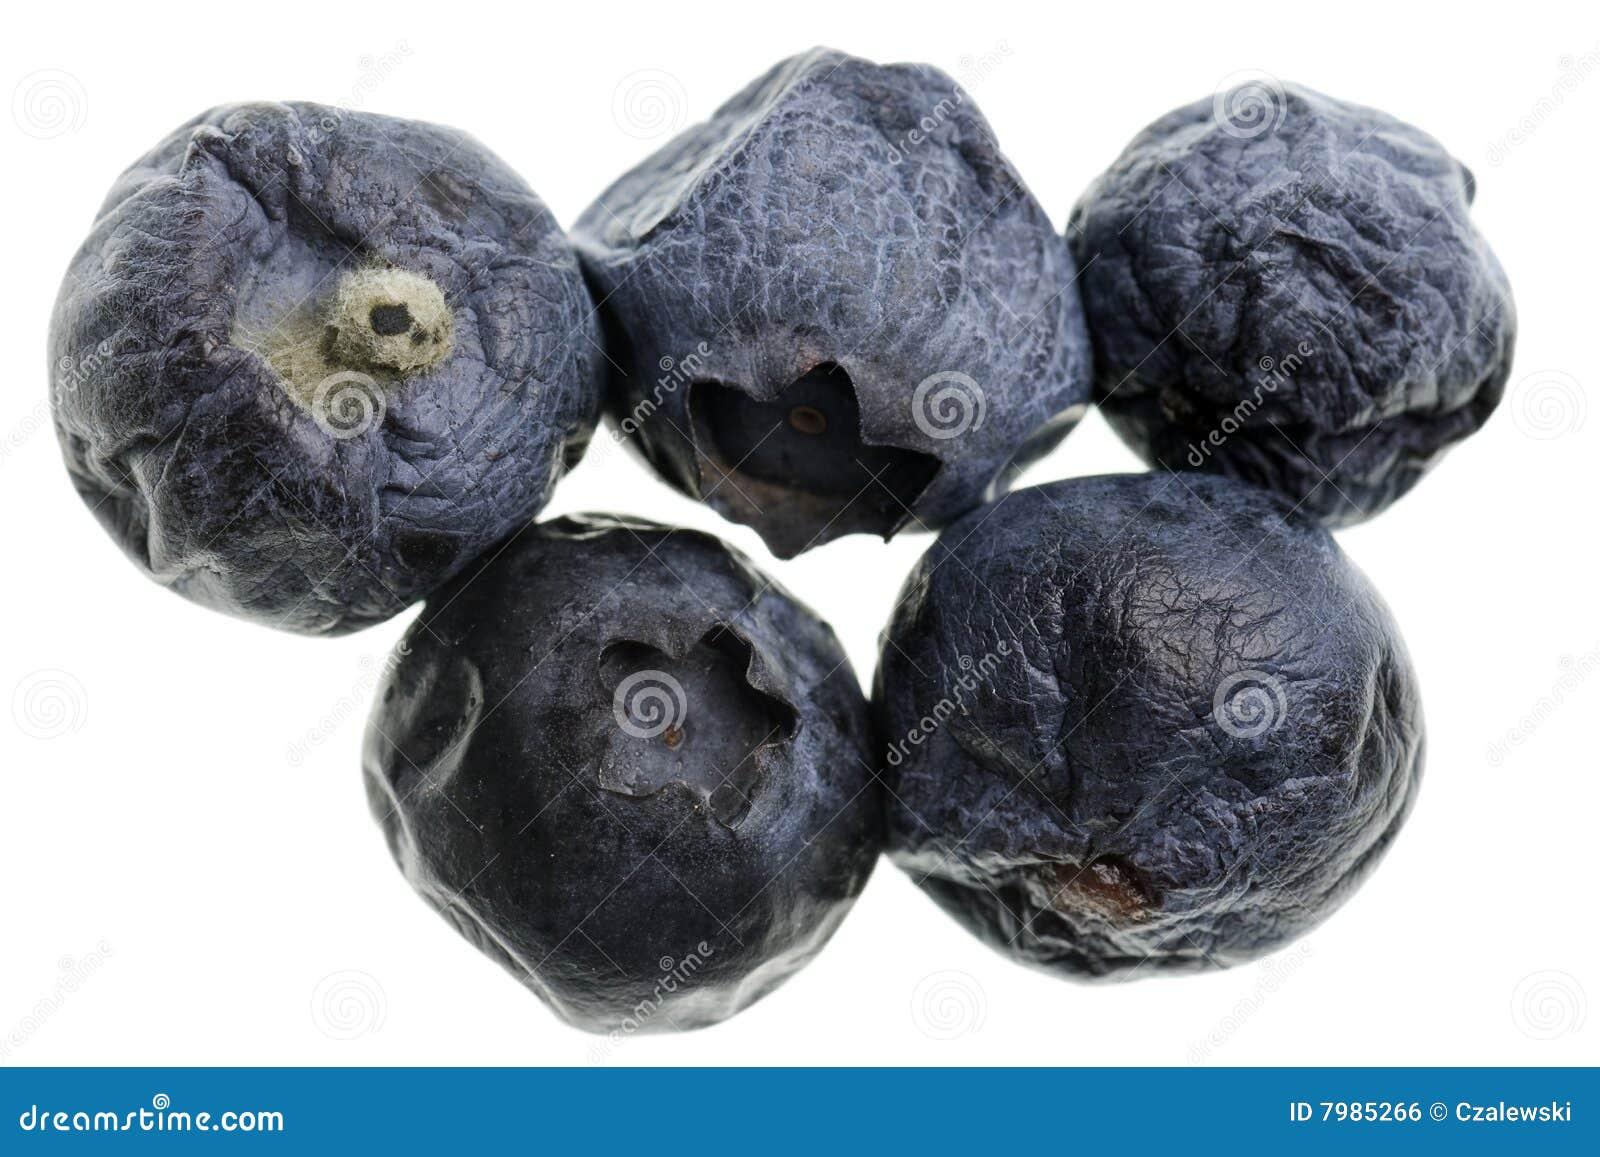 Moldy blueberries royalty free stock image image 7985266